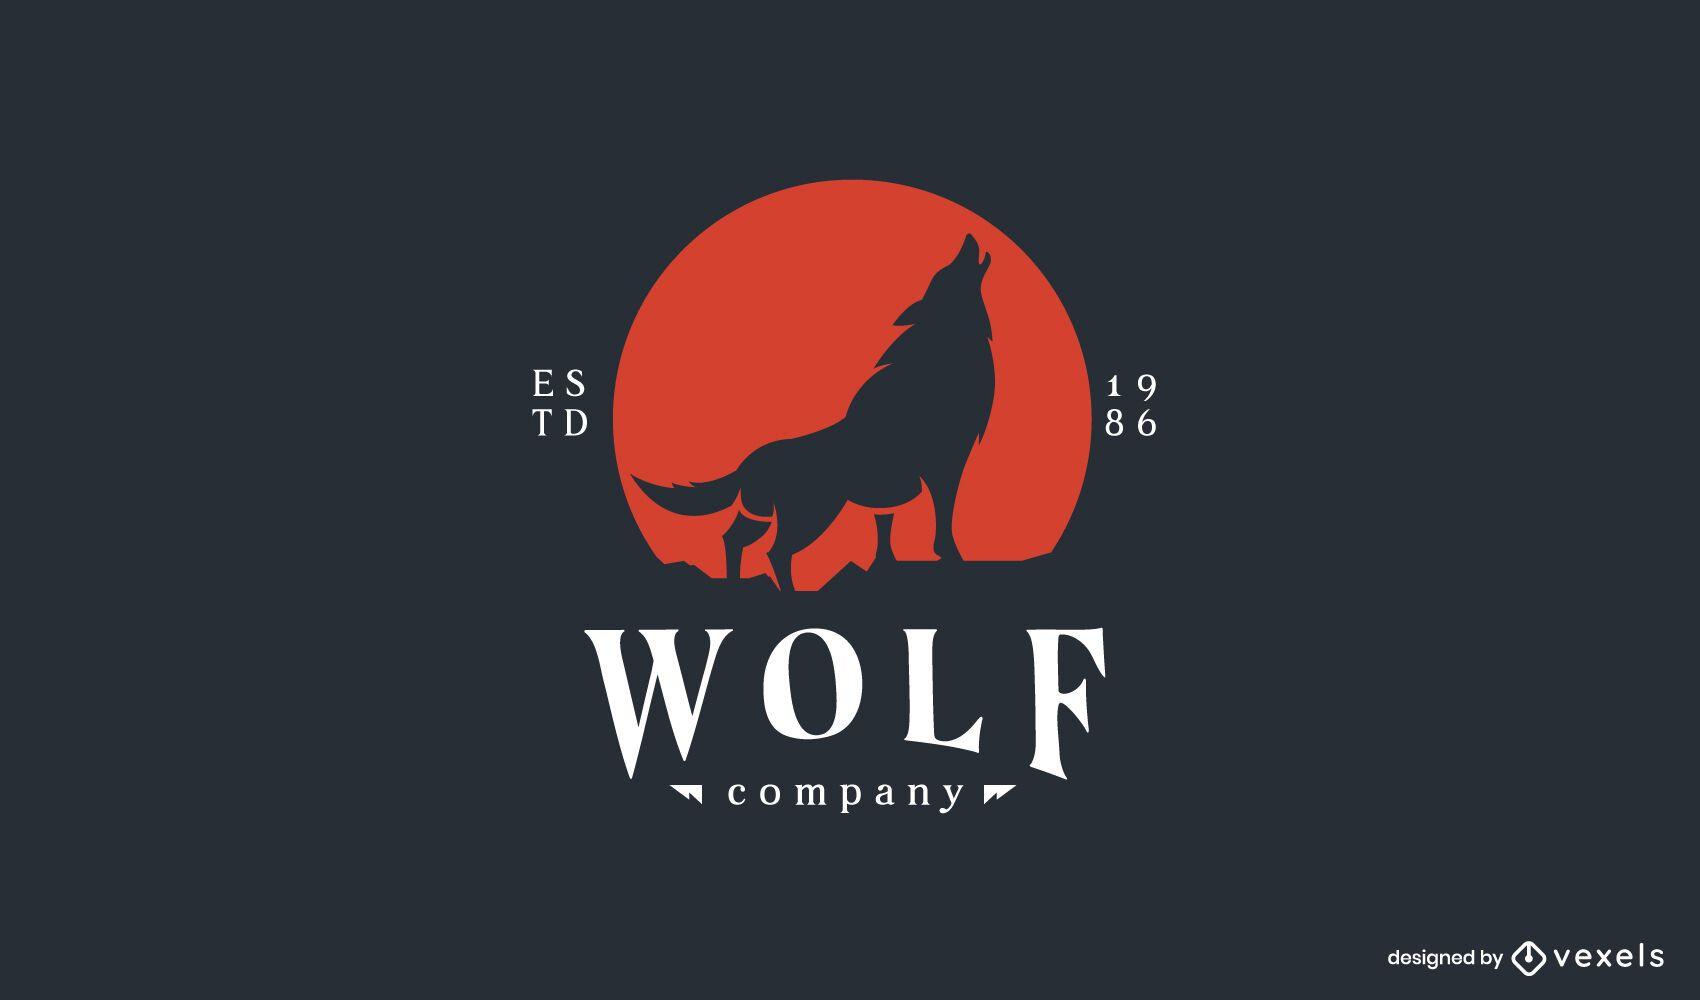 Wolf company logo template